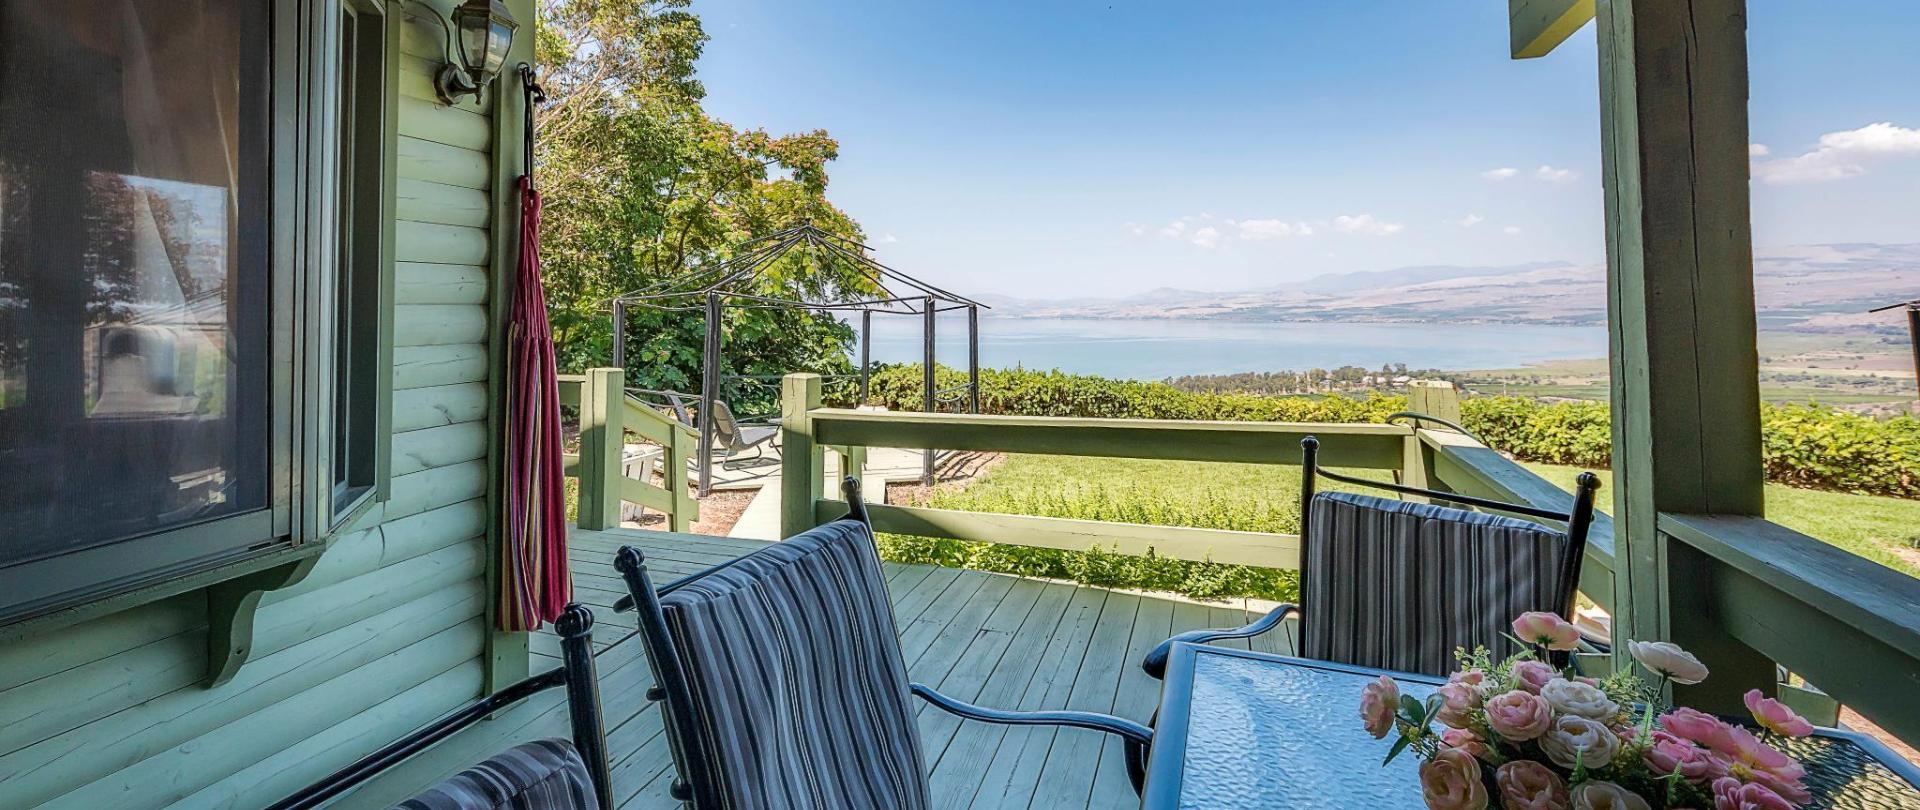 Sea of Galilee Panoramic View